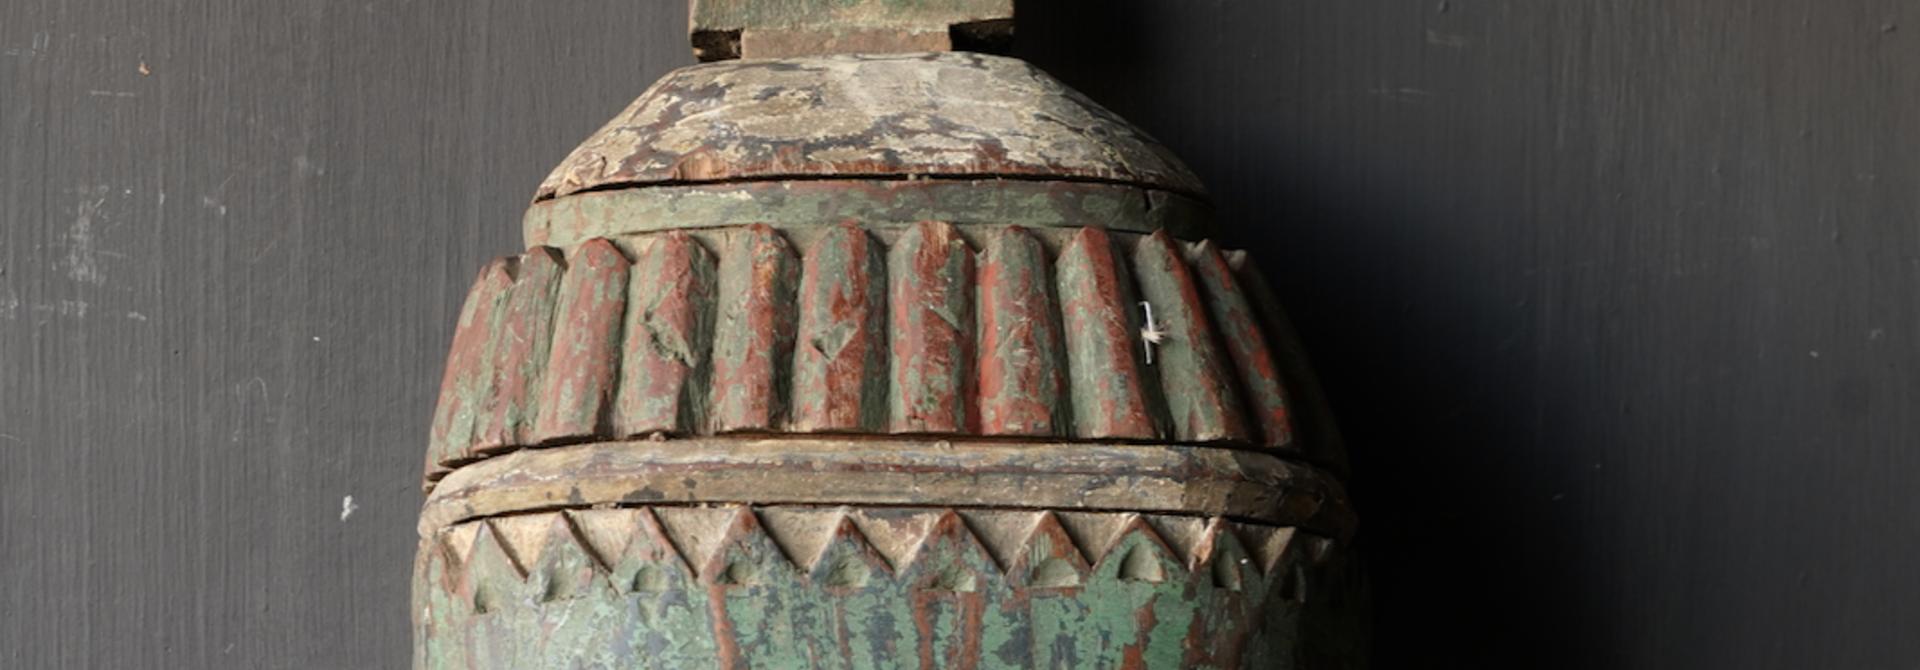 Unique Ancient Indian Ornament